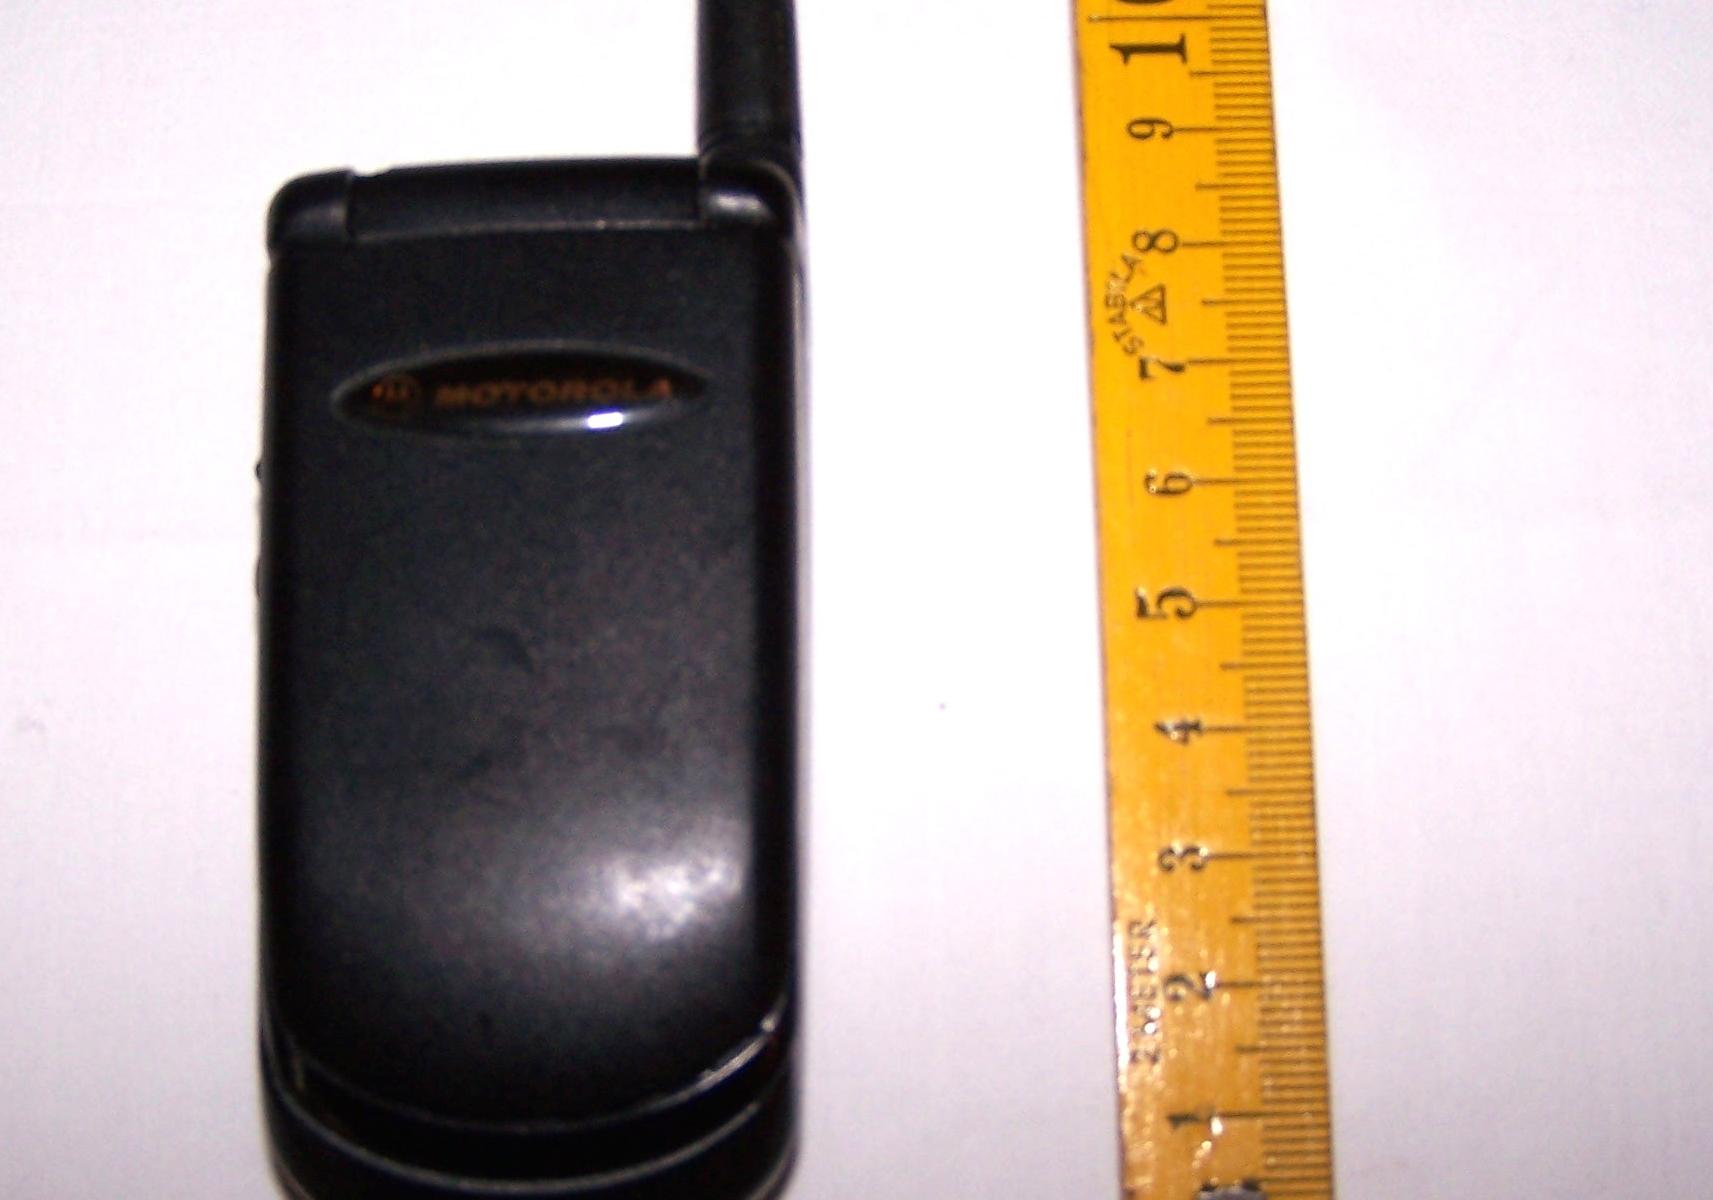 Büro - IT & Kommunikation - Mobiltelefon Motorola V3688